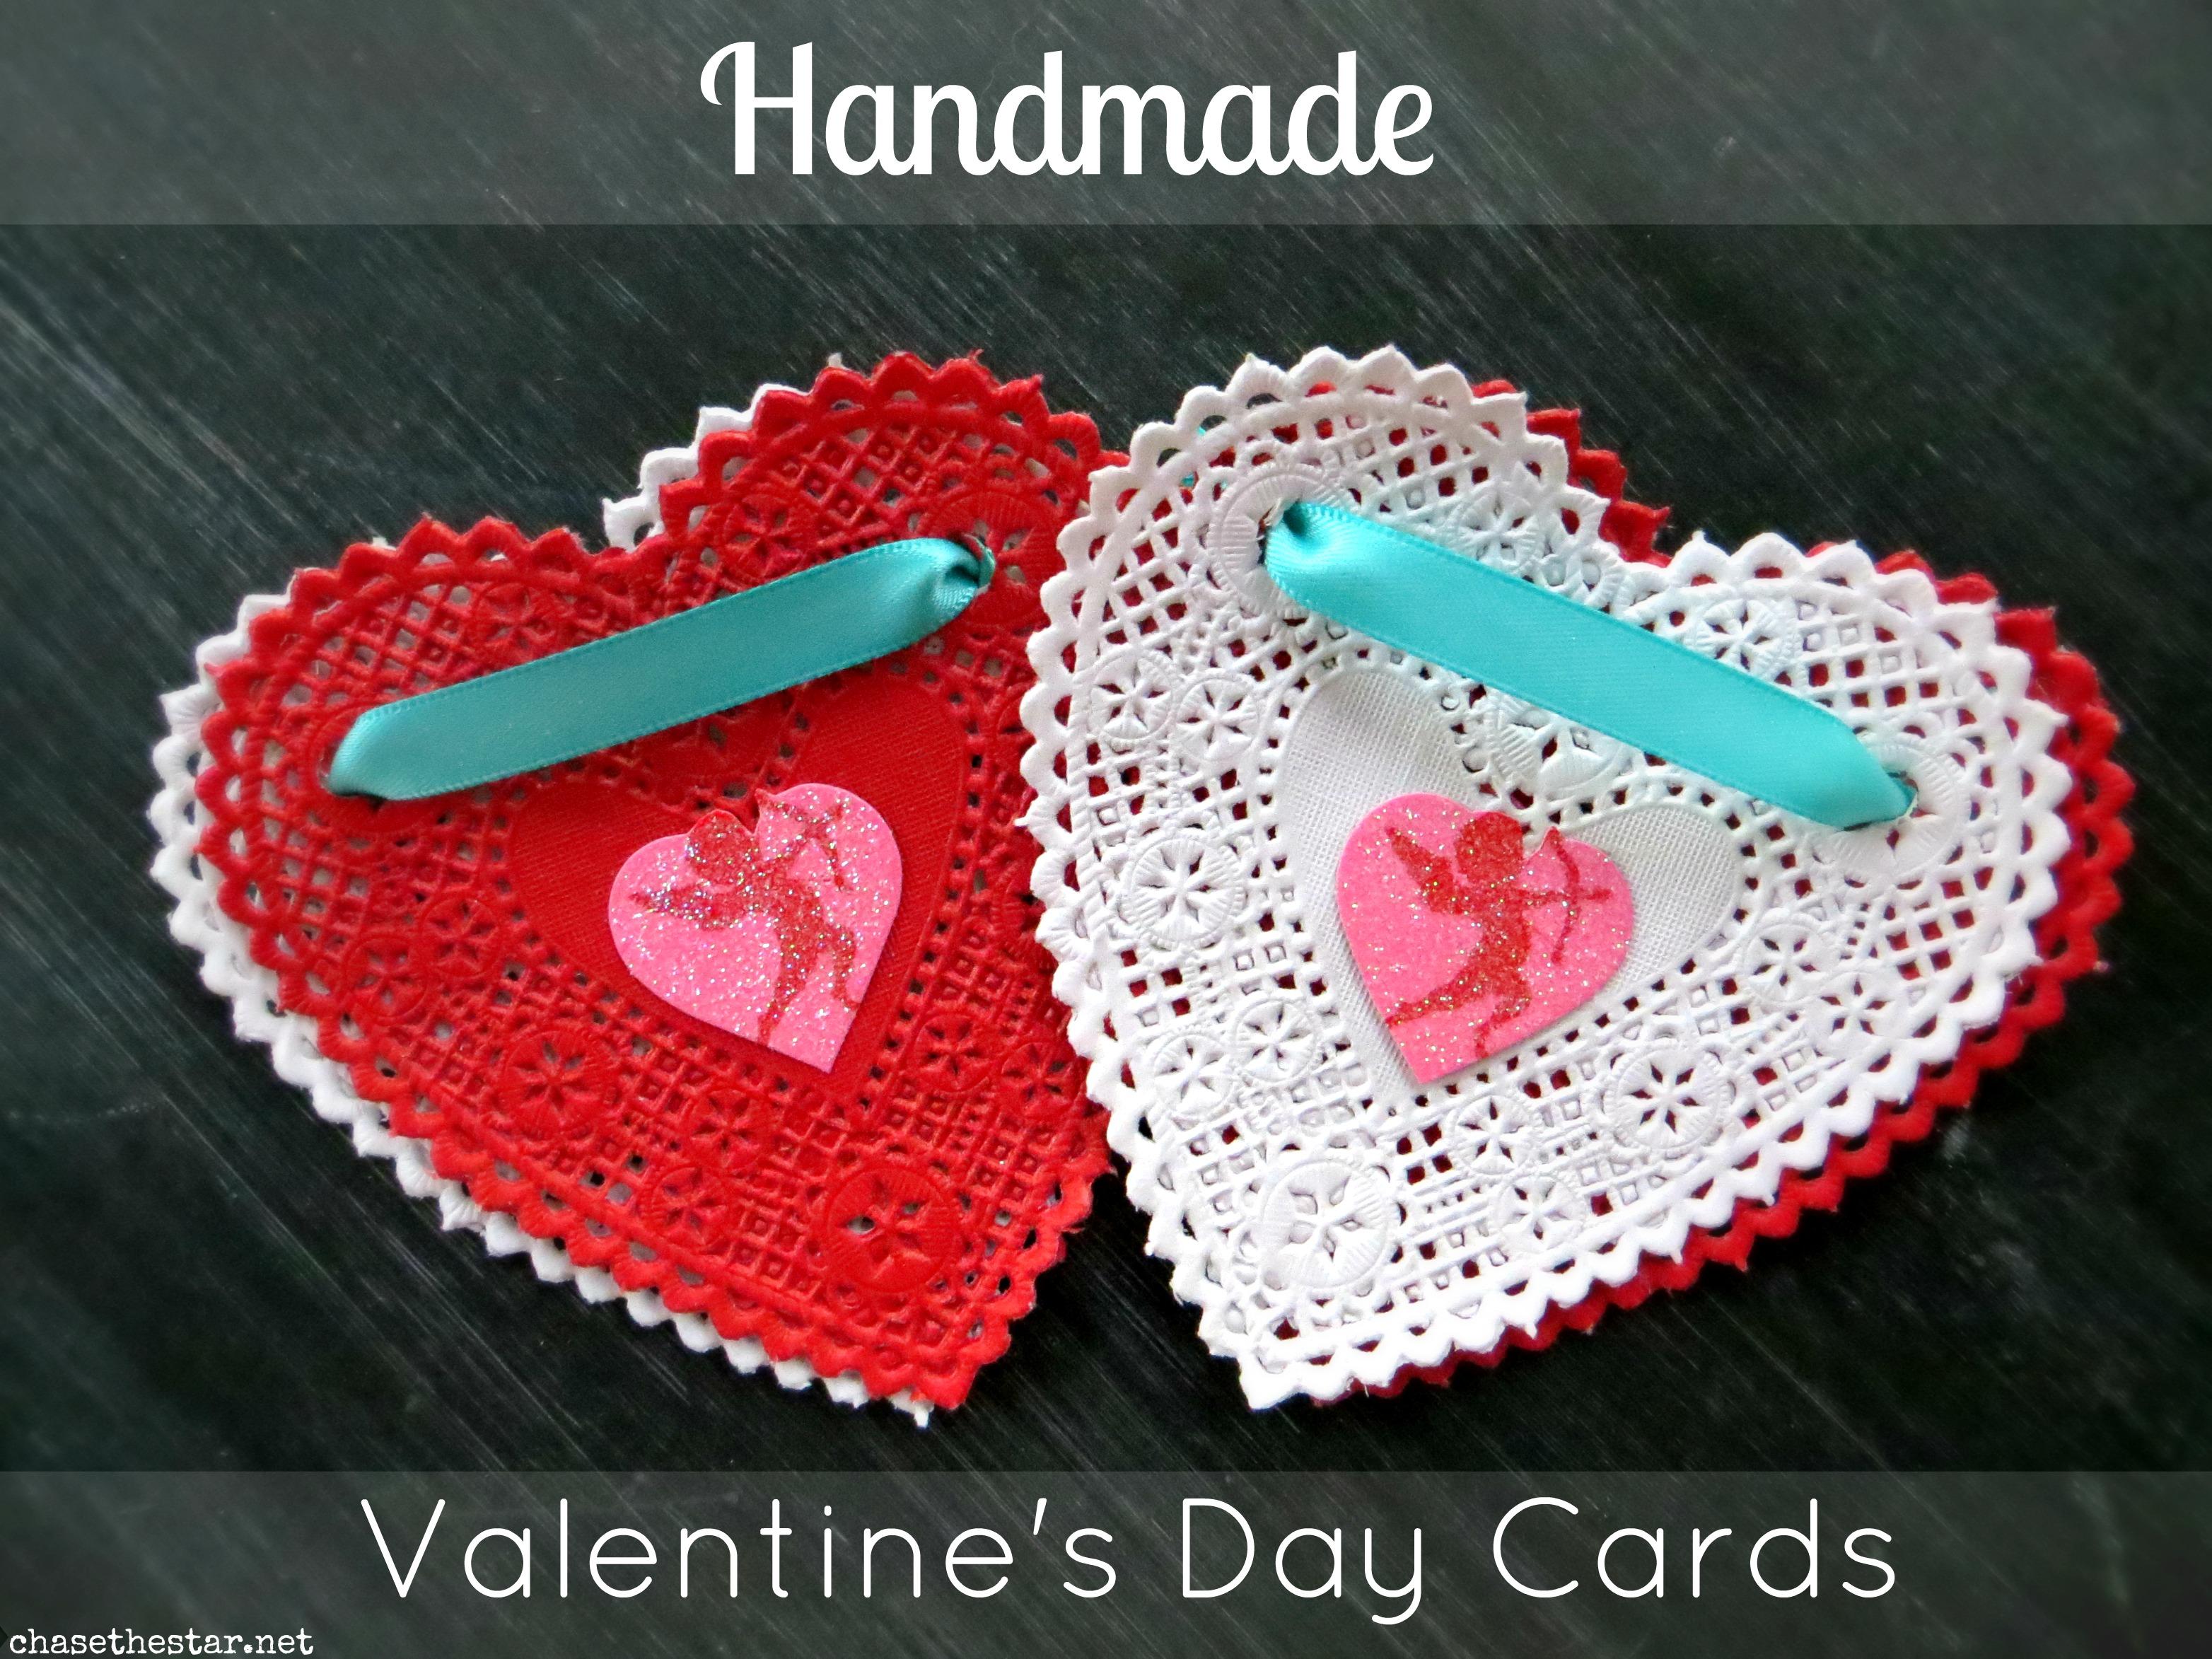 Handmade Valentine's Day cards #diyvalentines hellolifeonline.com